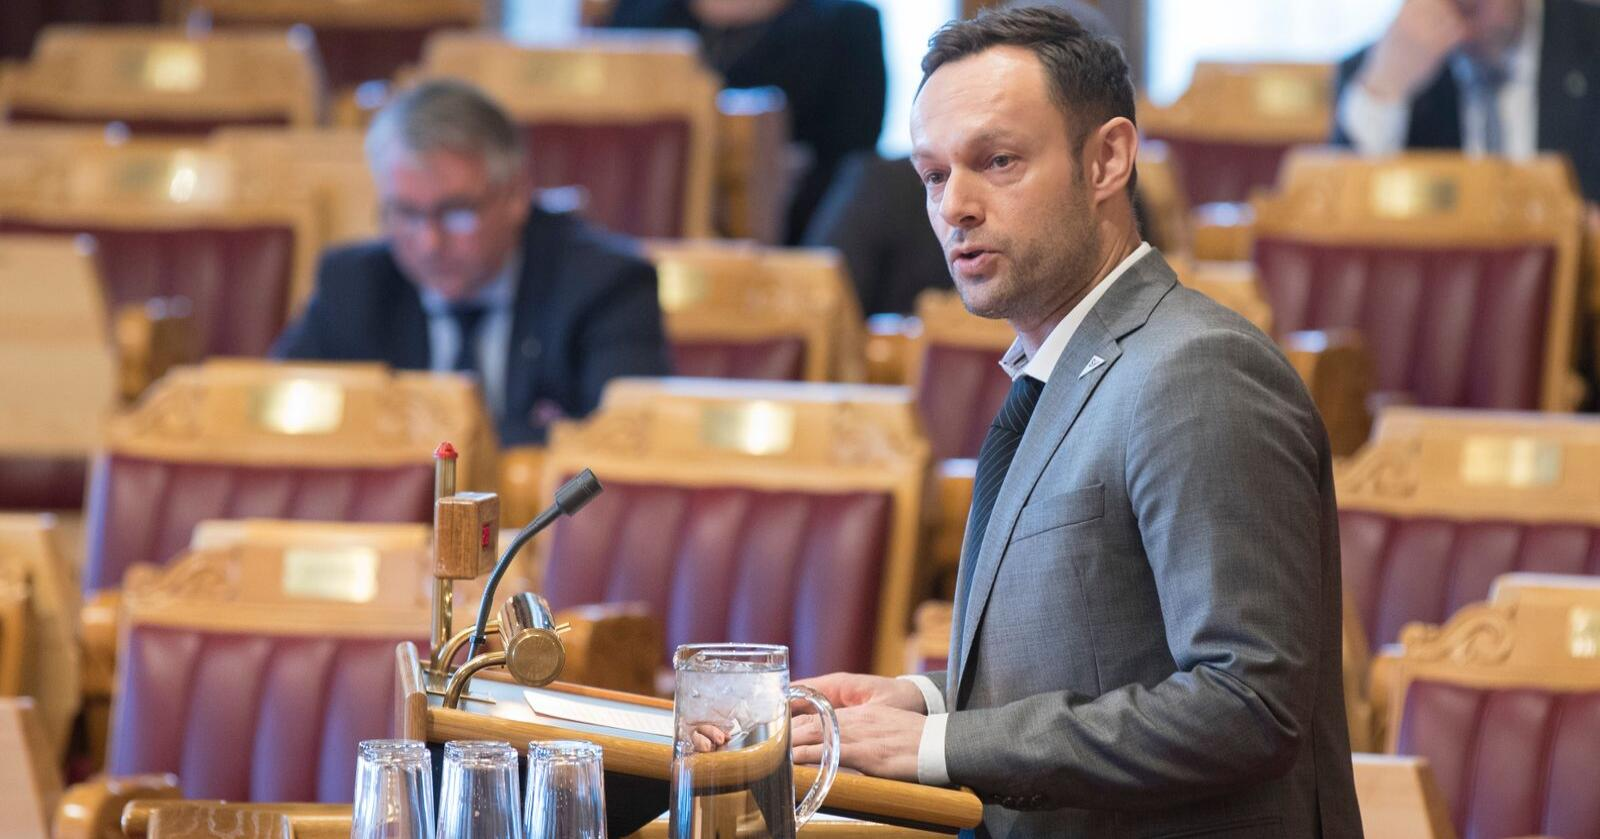 Parlamentarisk leder Torgeir Knag Fylkesnes i SV vil ha statsminister Erna Solberg (H) inn på teppet i forbindelse med ambulanseflysaken. Arkivfoto: Vidar Ruud / NTB scanpix